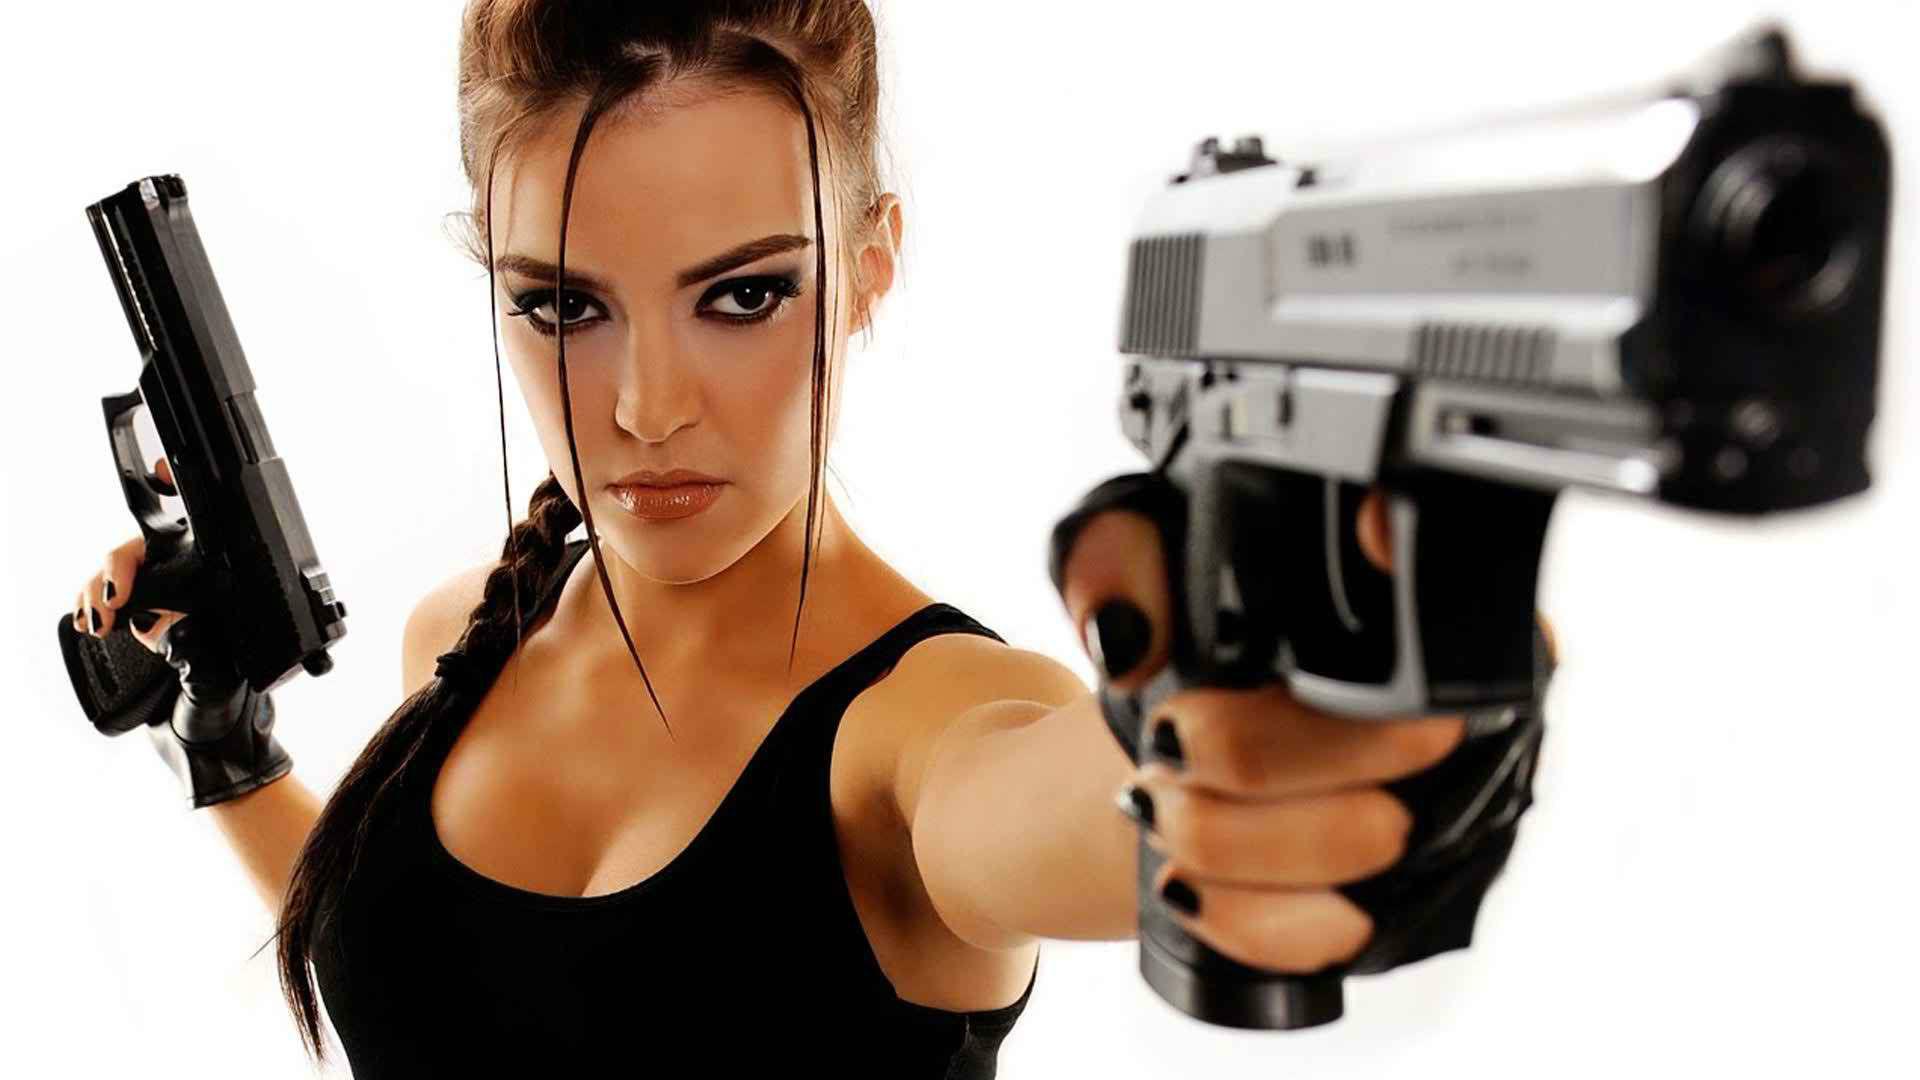 Beautiful Girl with Guns Wallpaper